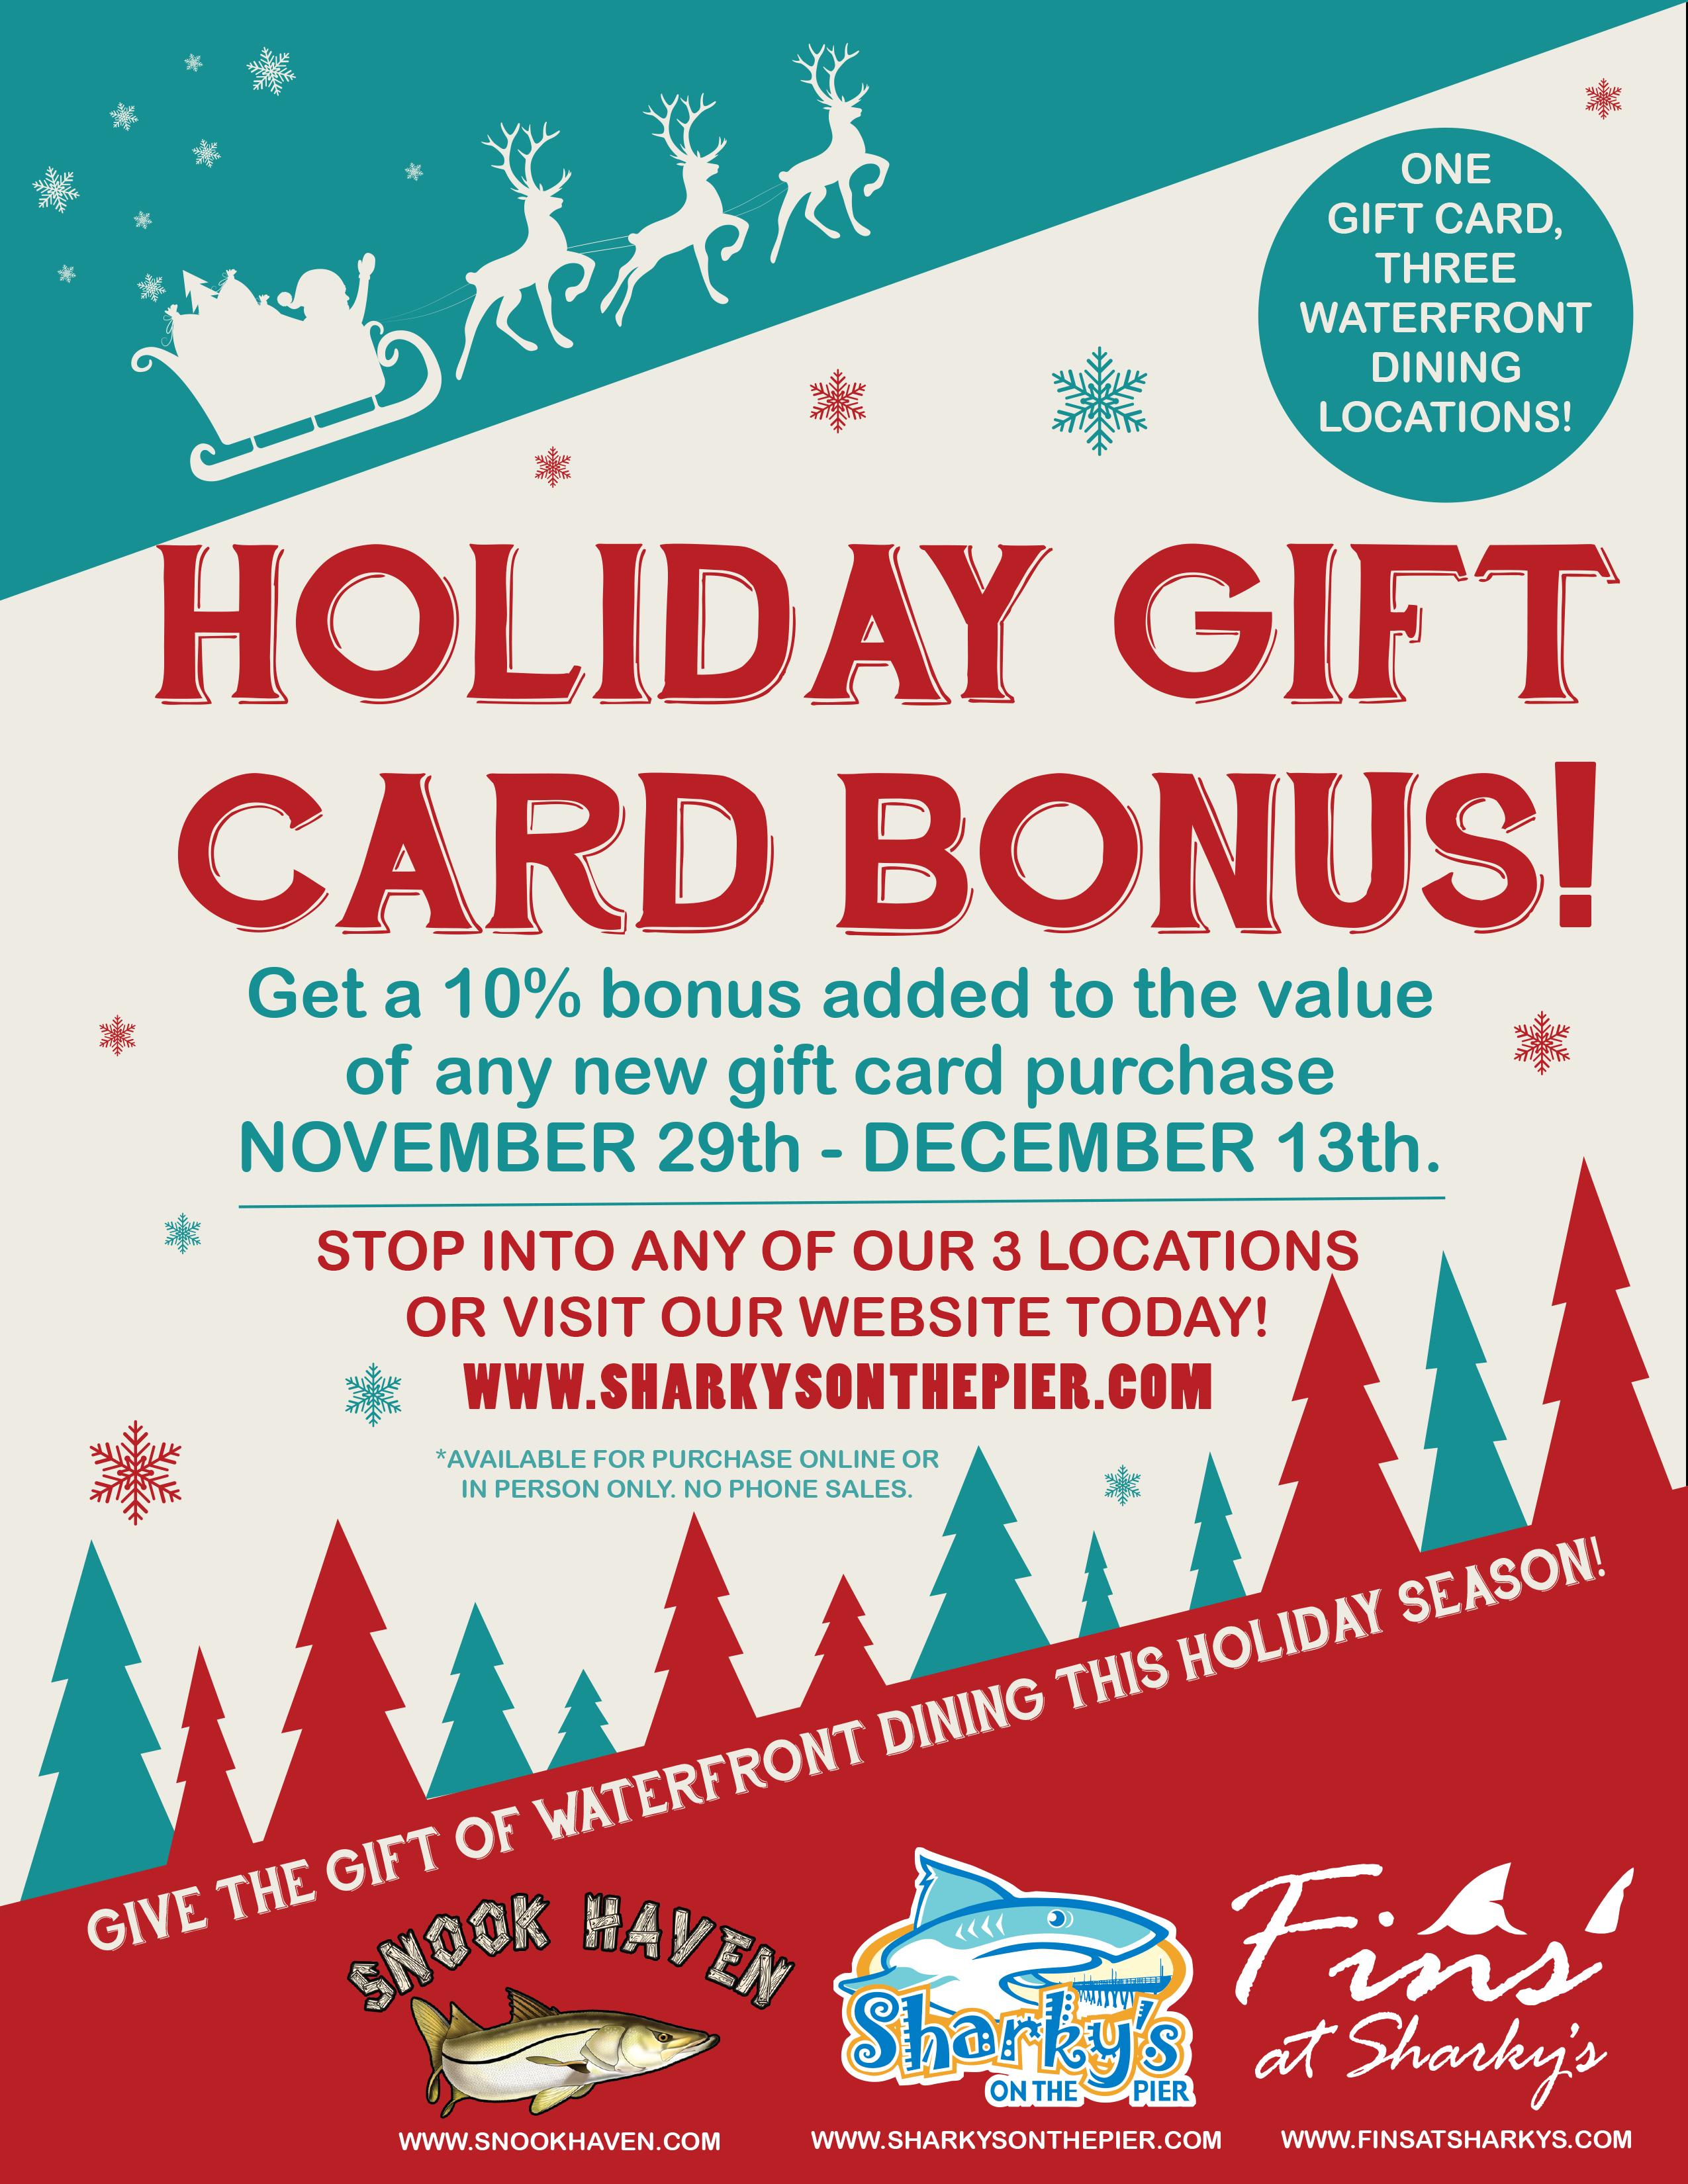 2019 Holiday Gift Card BONUS!